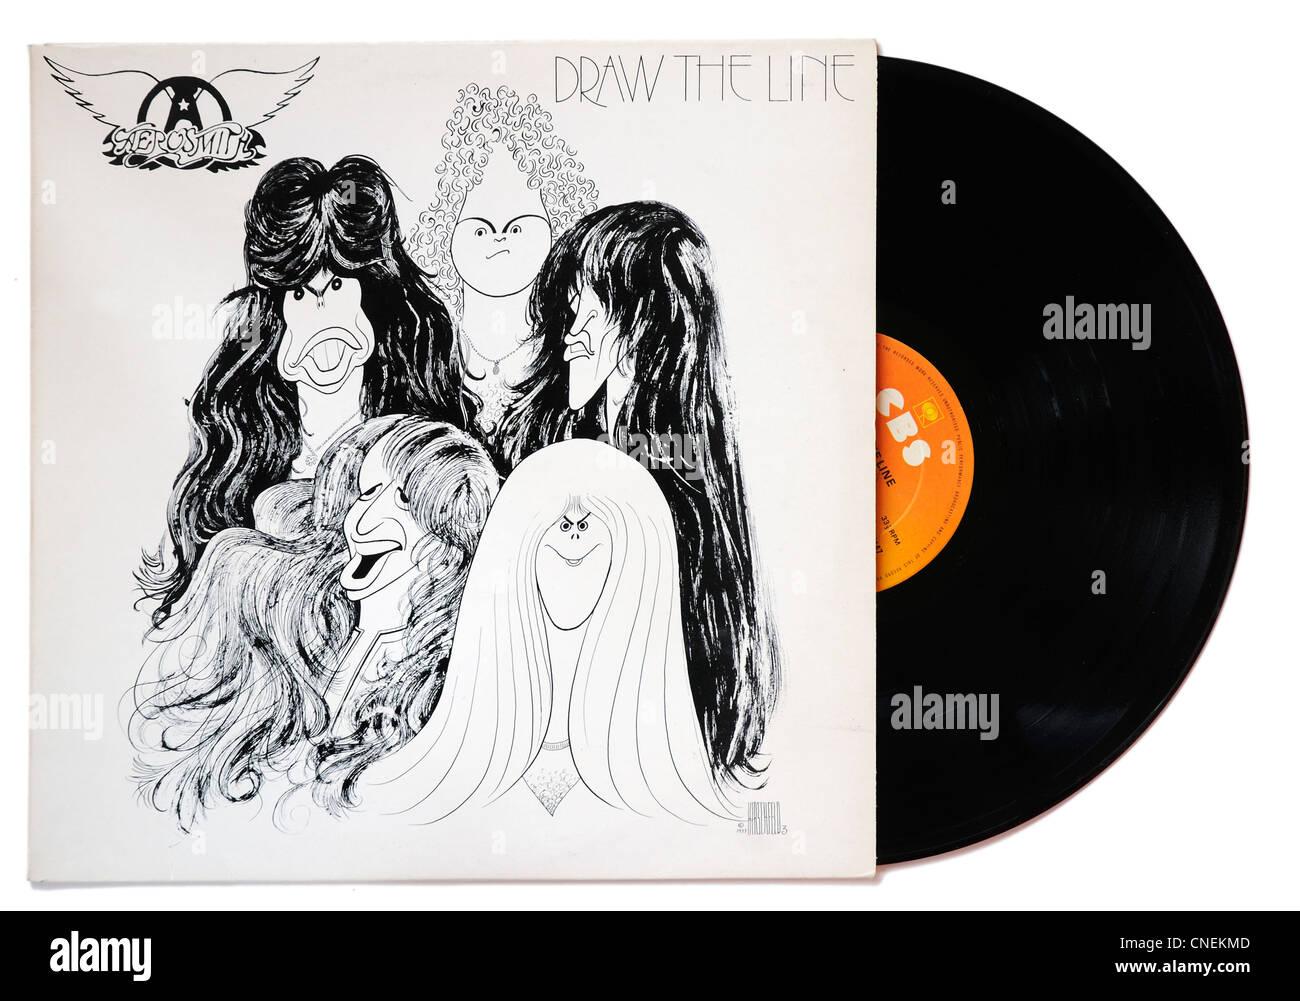 Aerosmith Draw The Line Album Stock Photo 47651309 Alamy